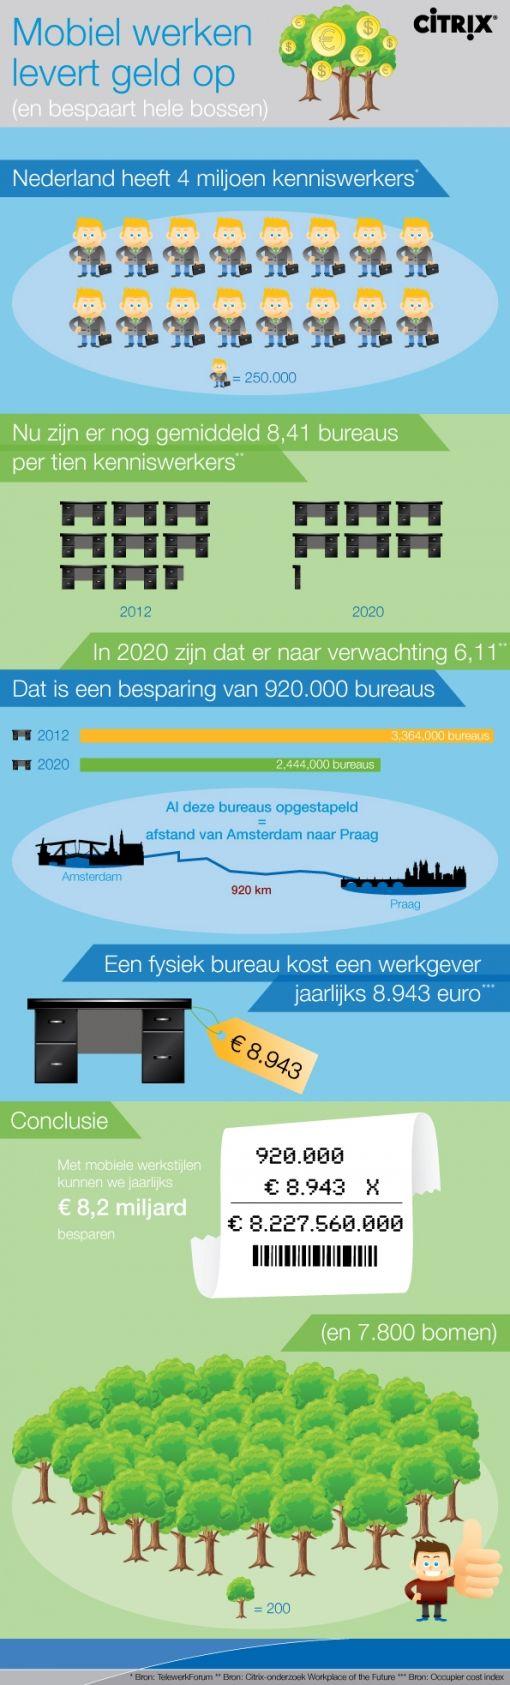 Citrix-infographic-NL_v2